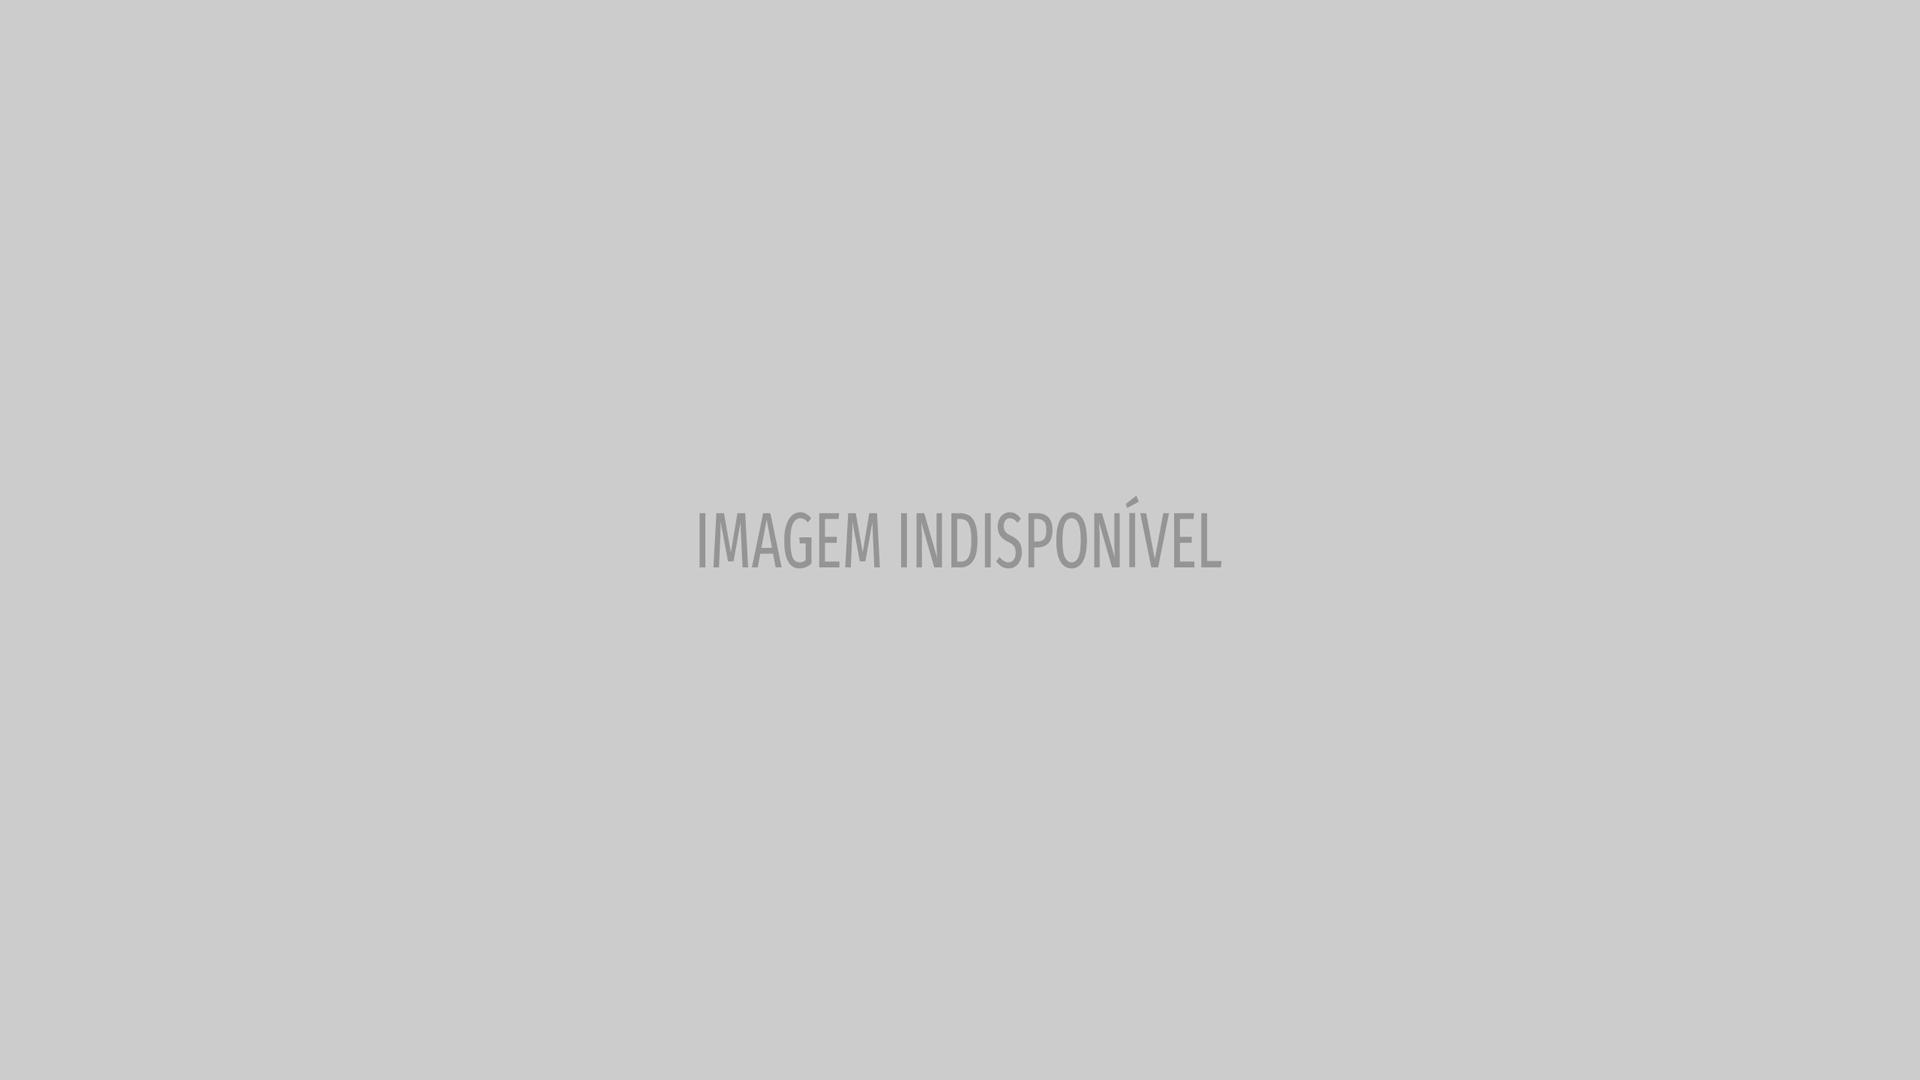 Reduza o colesterol comendo estes alimentos